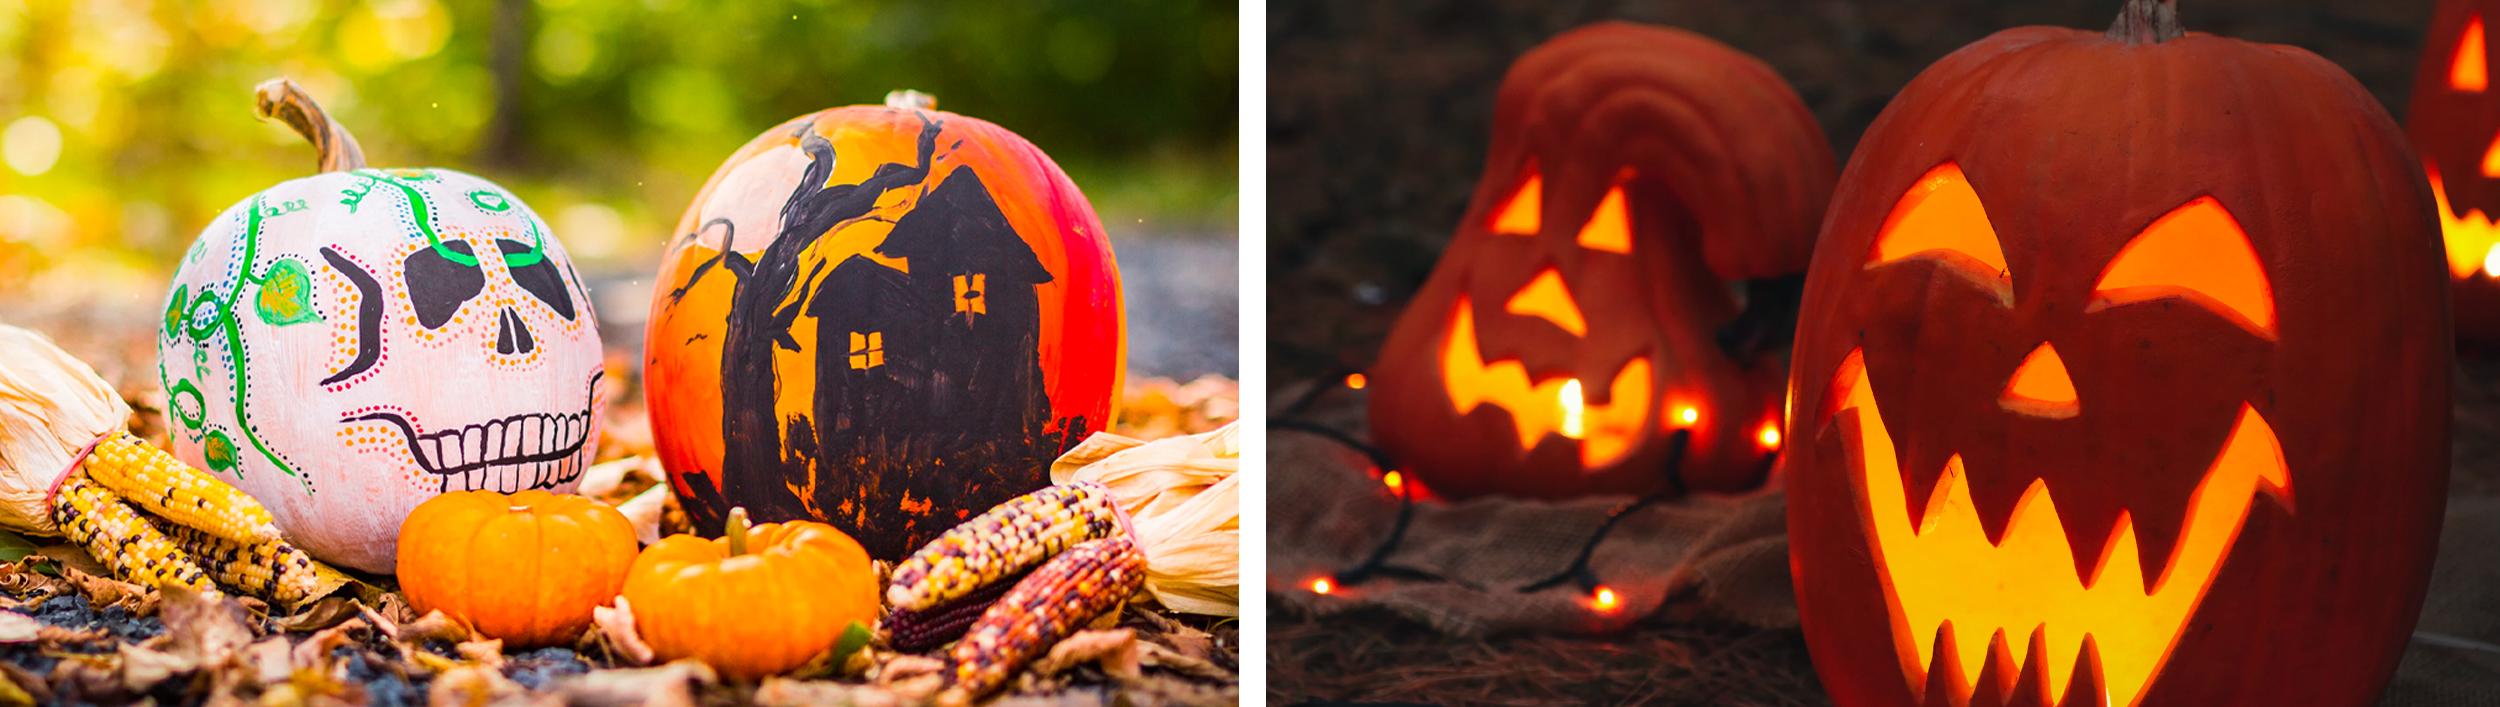 pumpkin patch decoration carving halloween painting characters nightmare before christmas skeleton jack tim burton